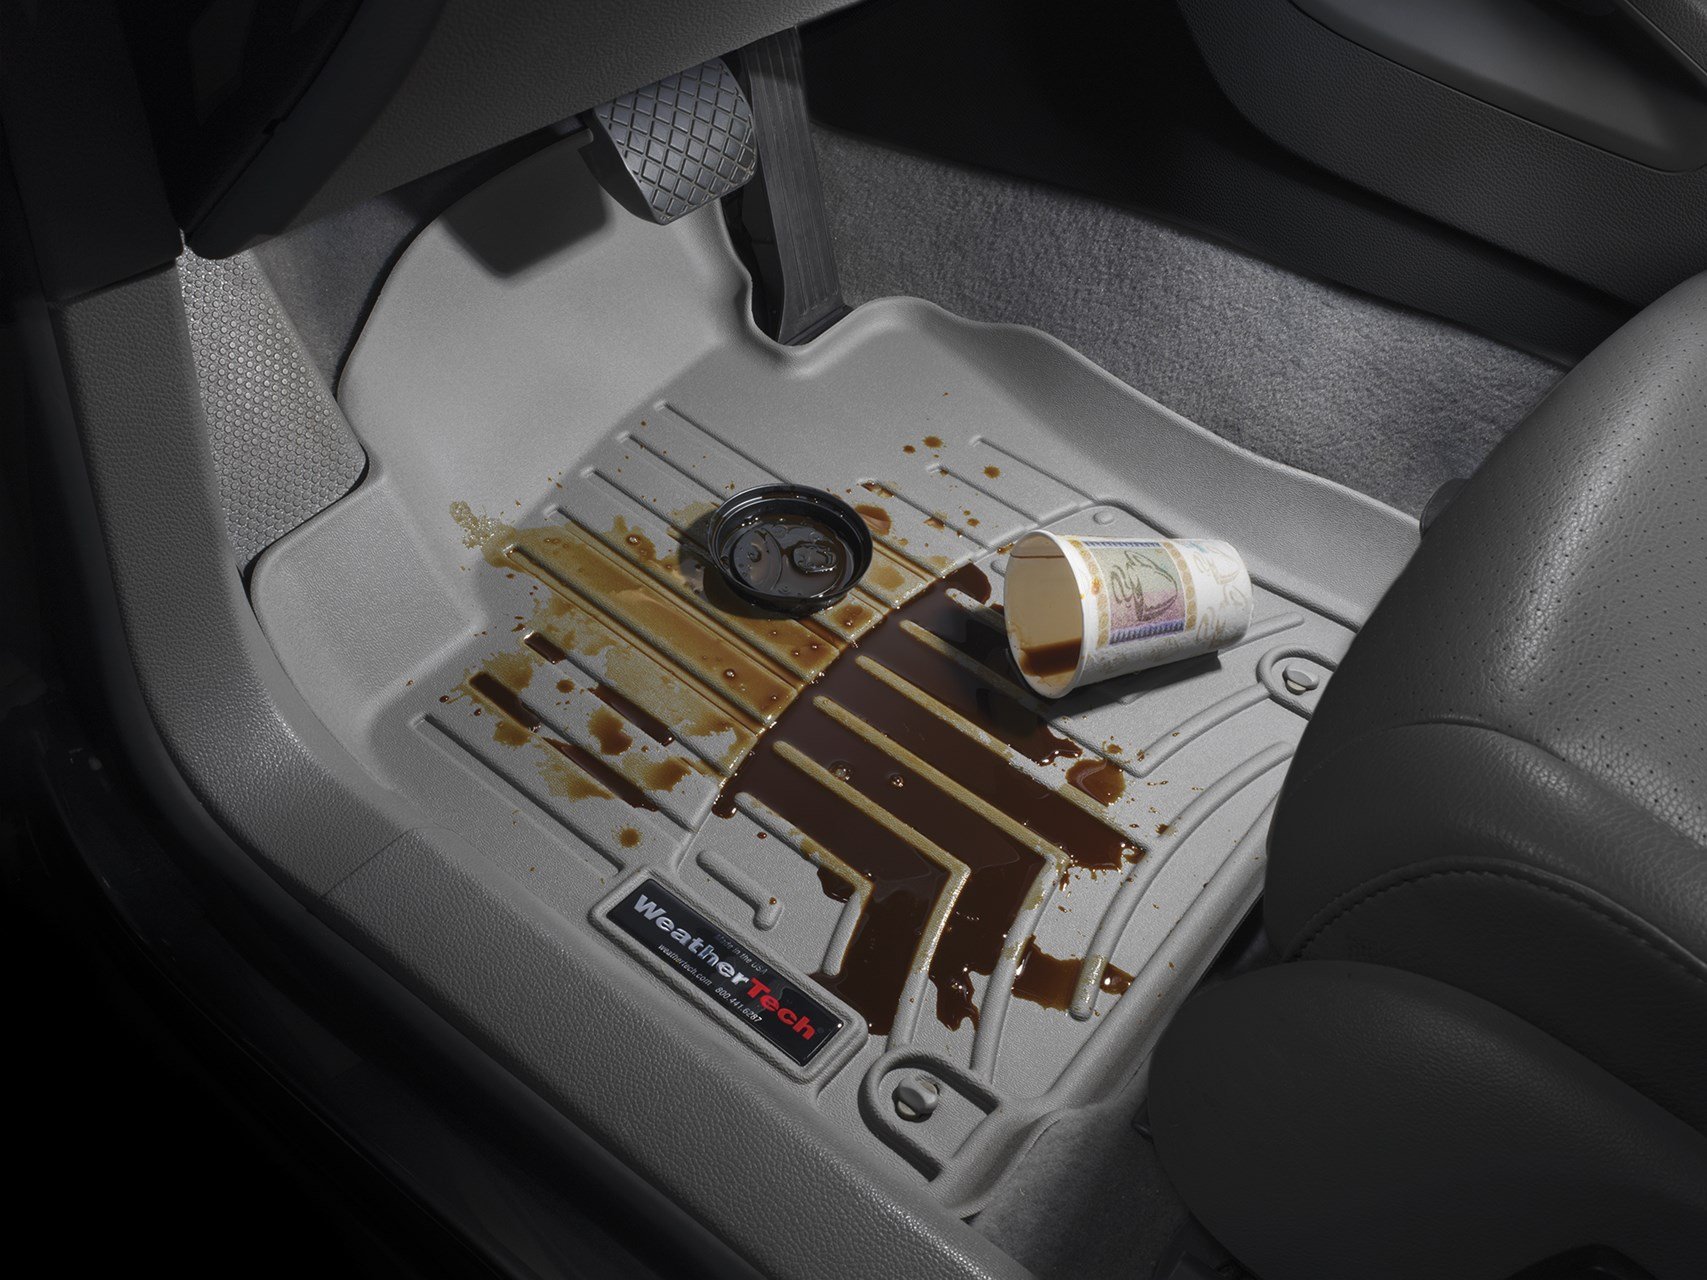 Coffee Spilt on WeatherTech Mat